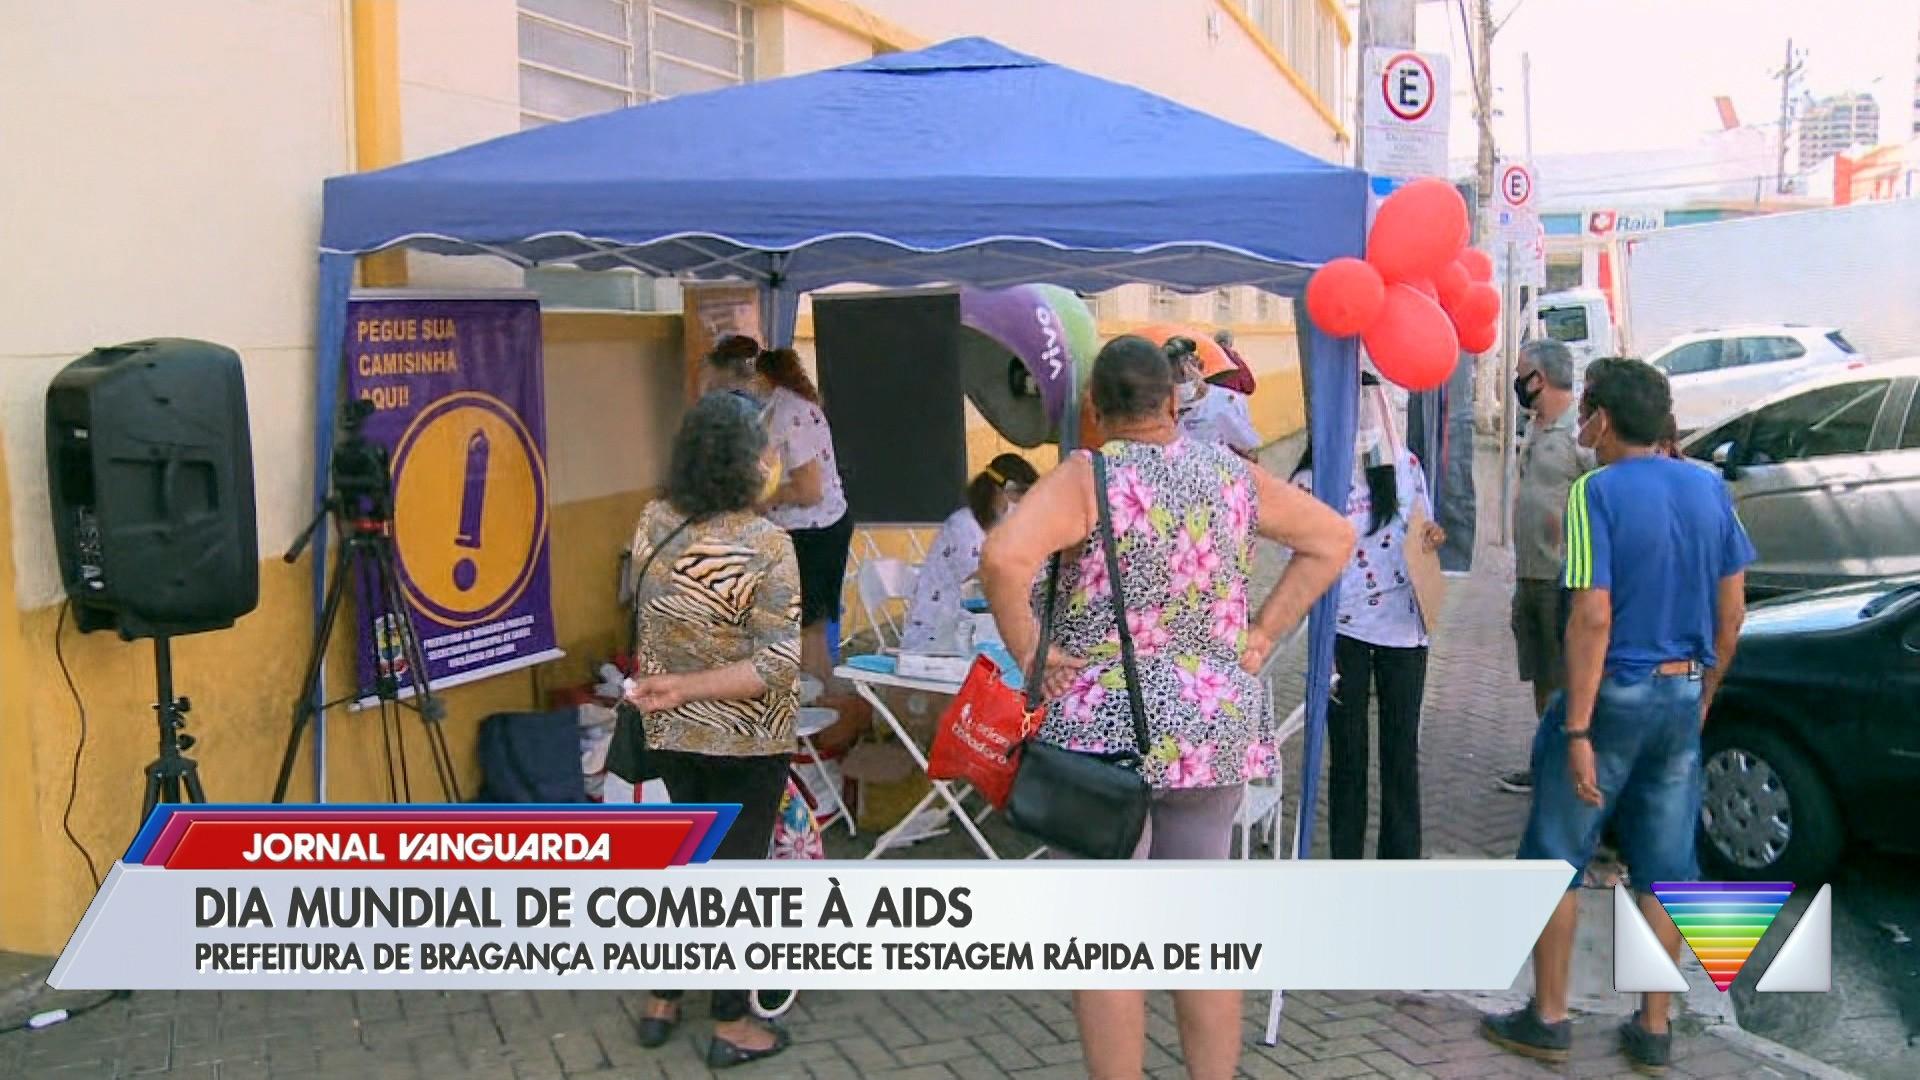 VÍDEOS: Jornal Vanguarda de terça-feira, 1° de dezembro